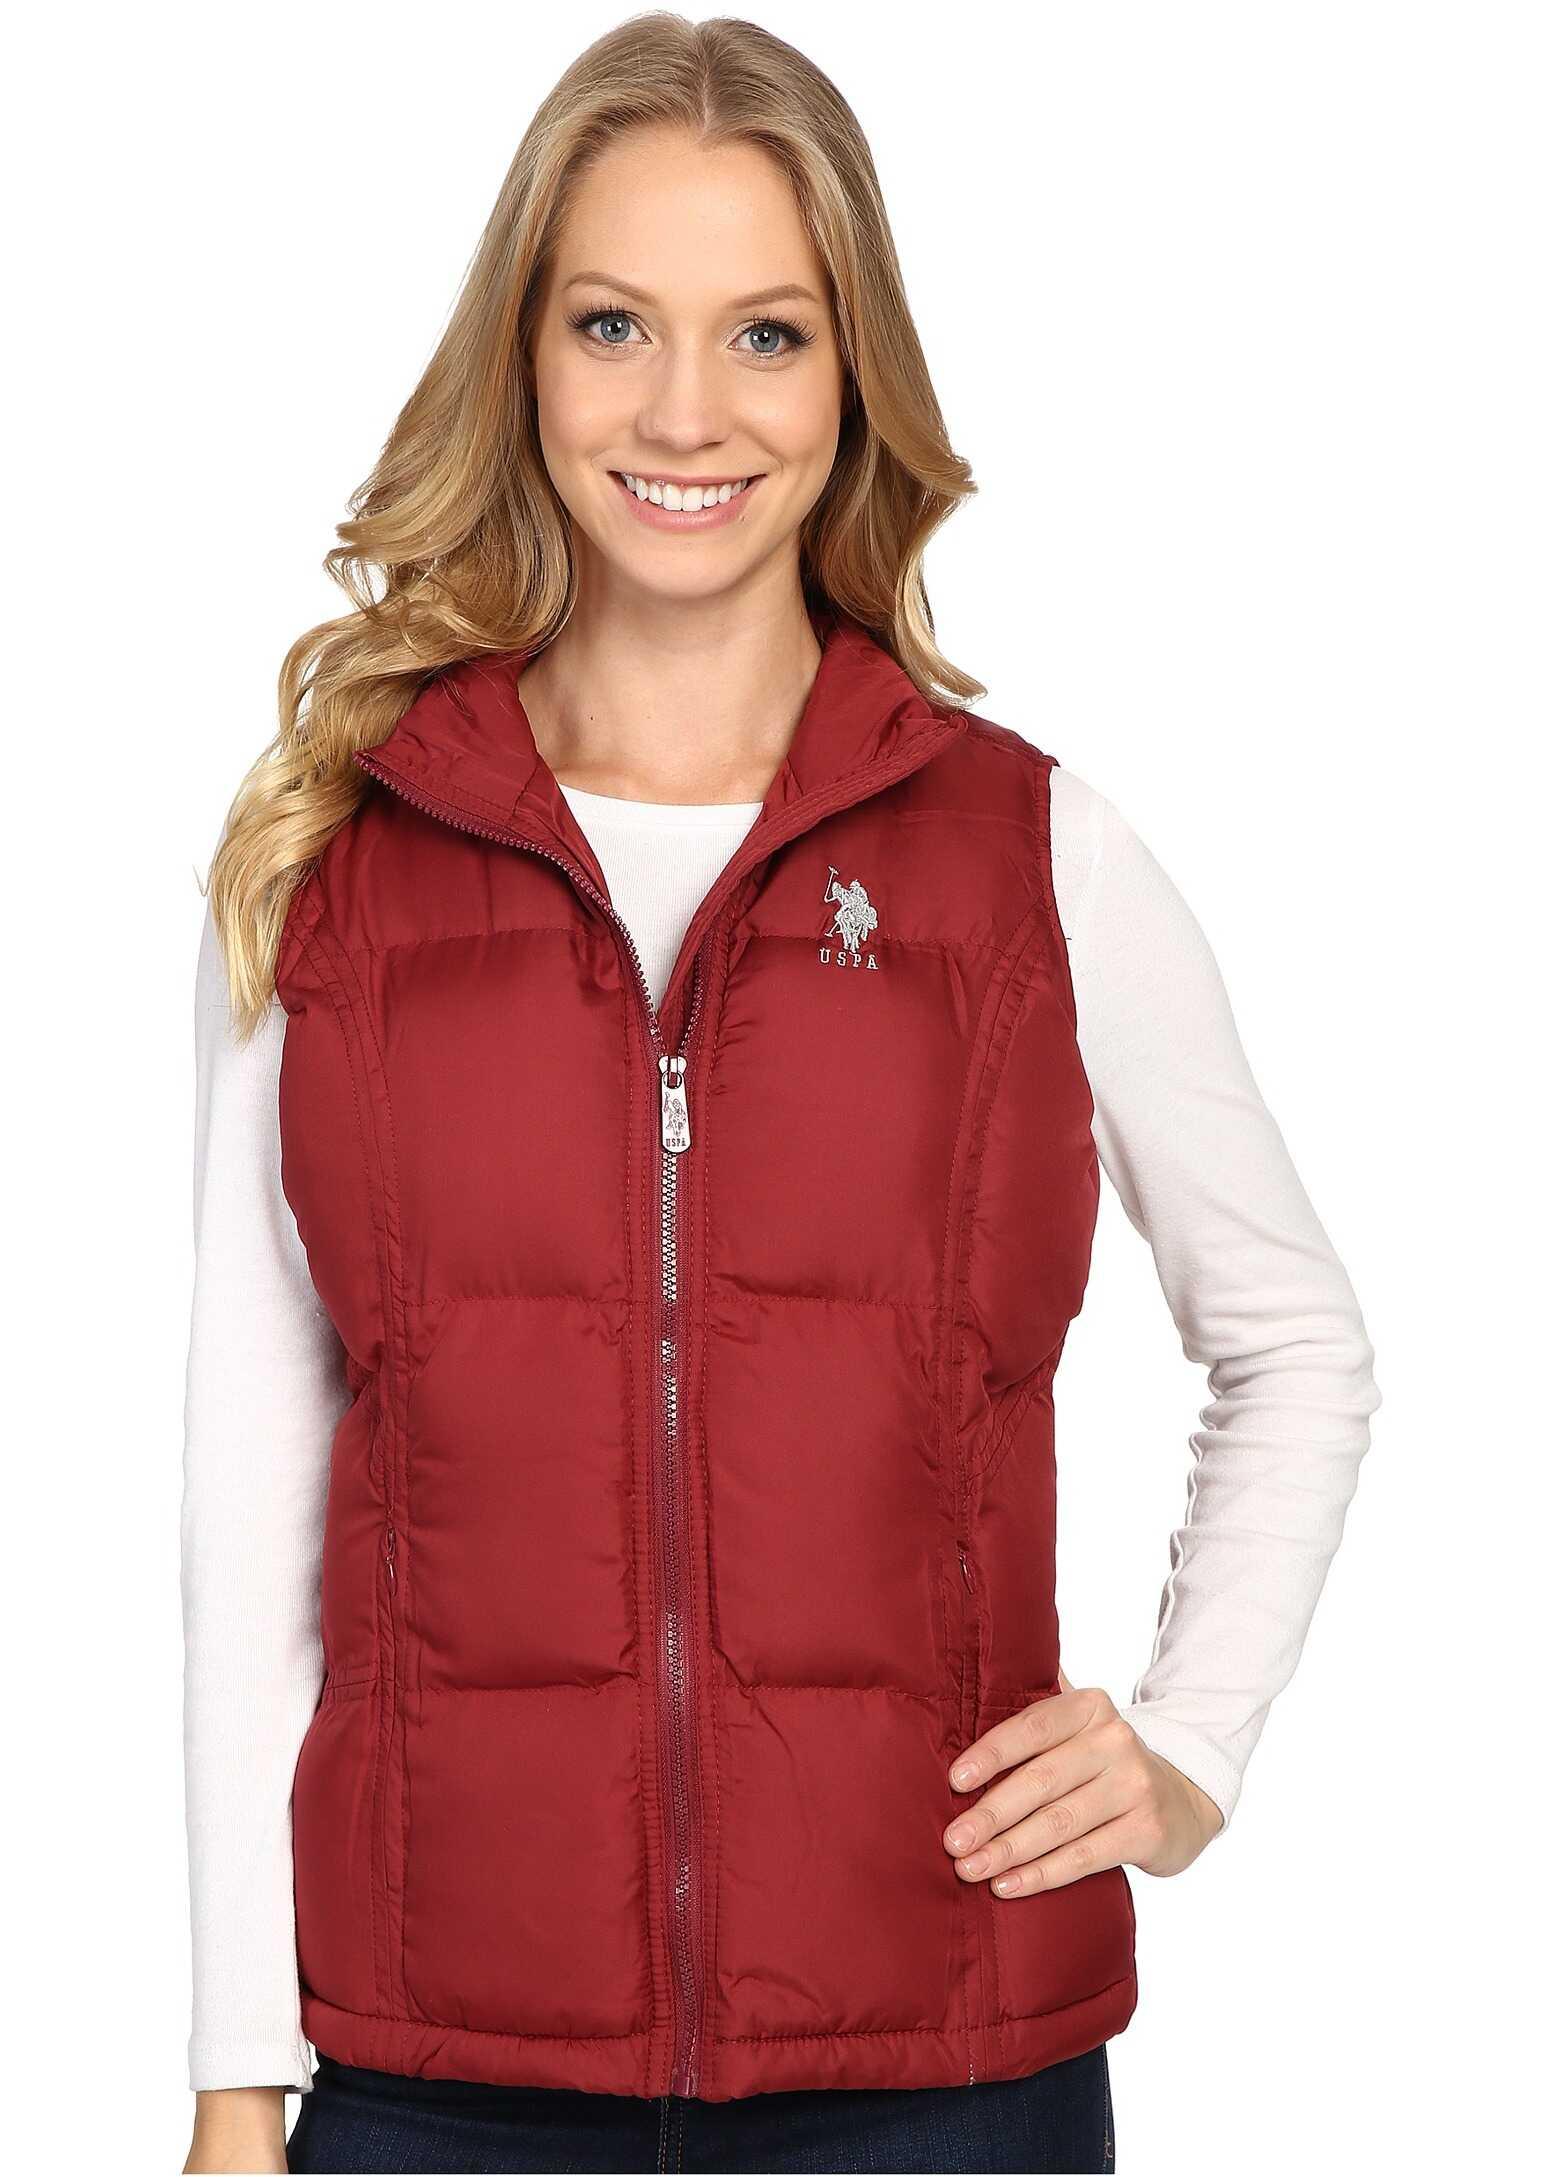 U.S. POLO ASSN. Classic Puffer Vest Rumba Red